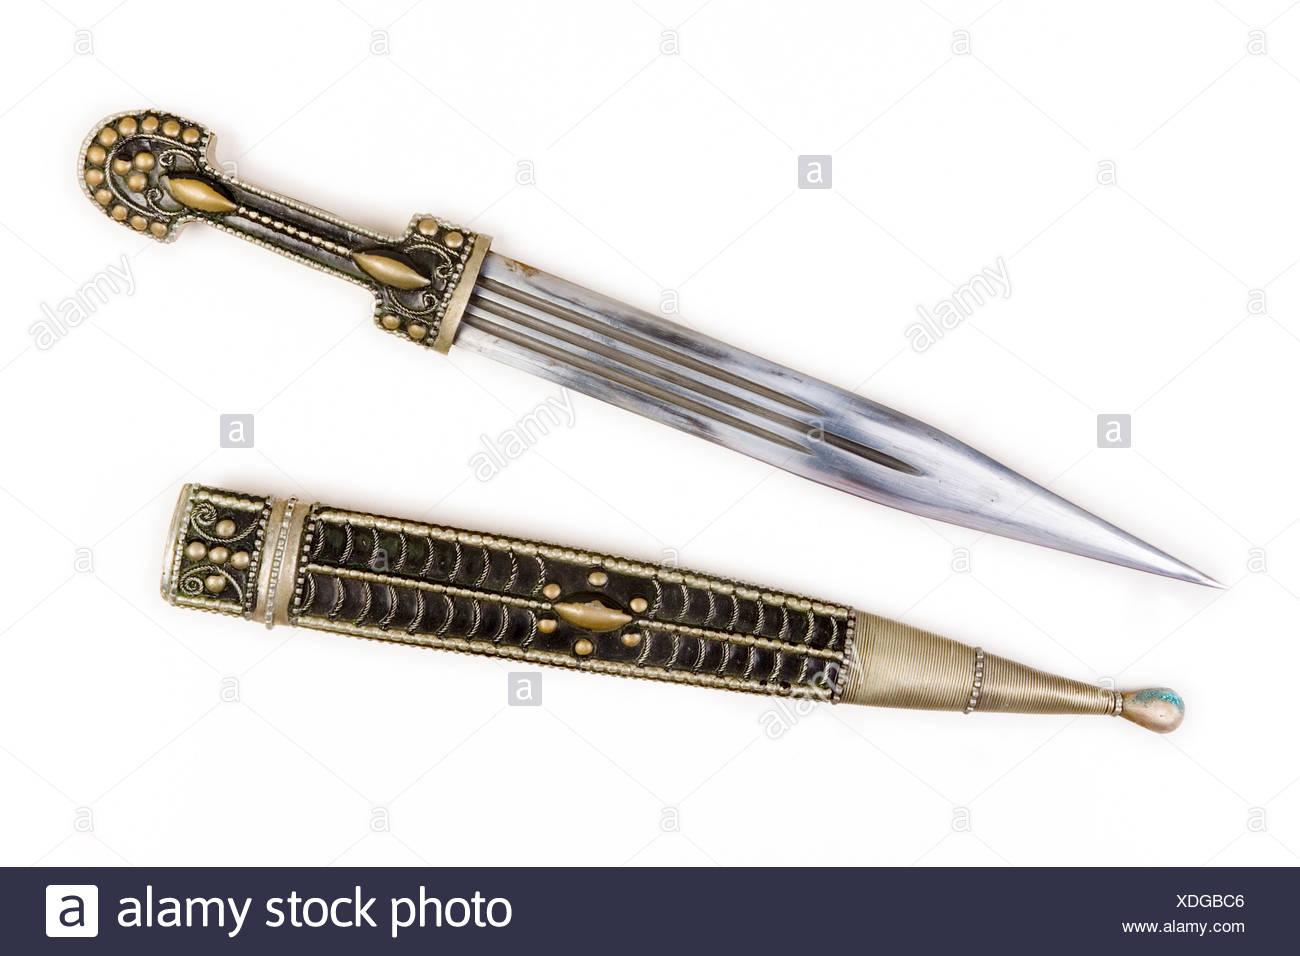 Caucasian dagger (Kinjal) 19 century - Stock Image